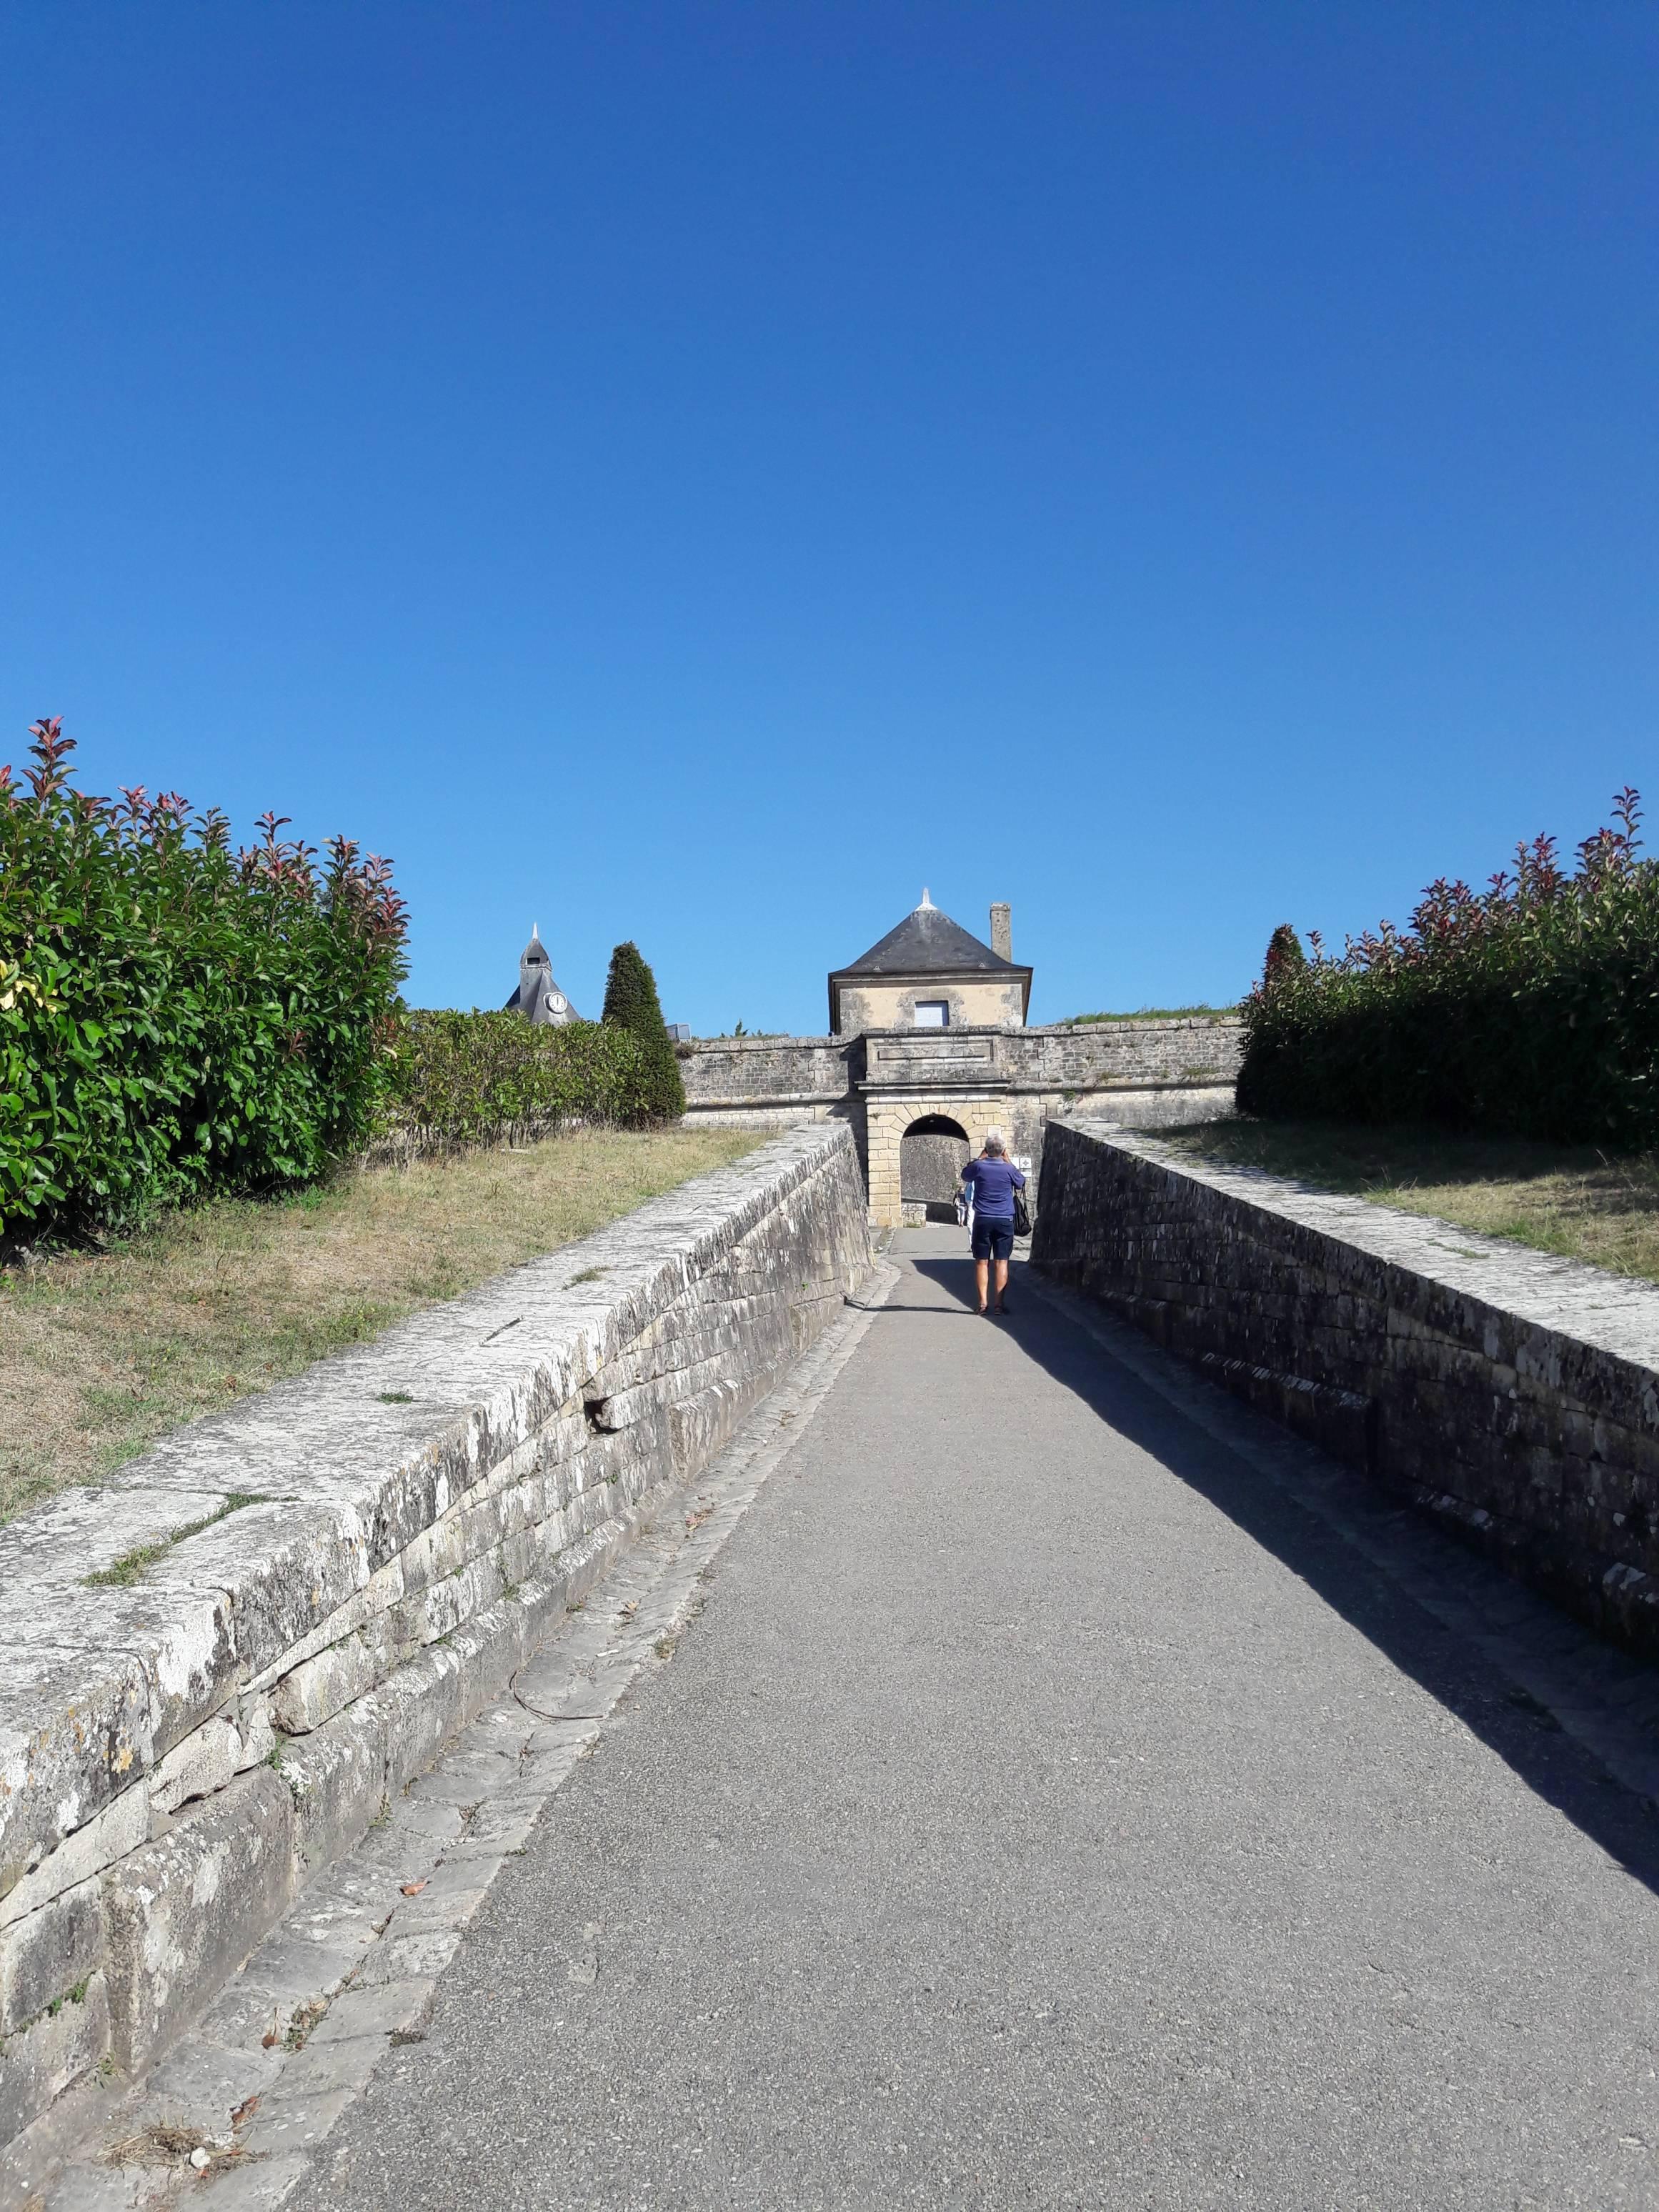 Photo 3: Promenade dans la citadelle de Blaye